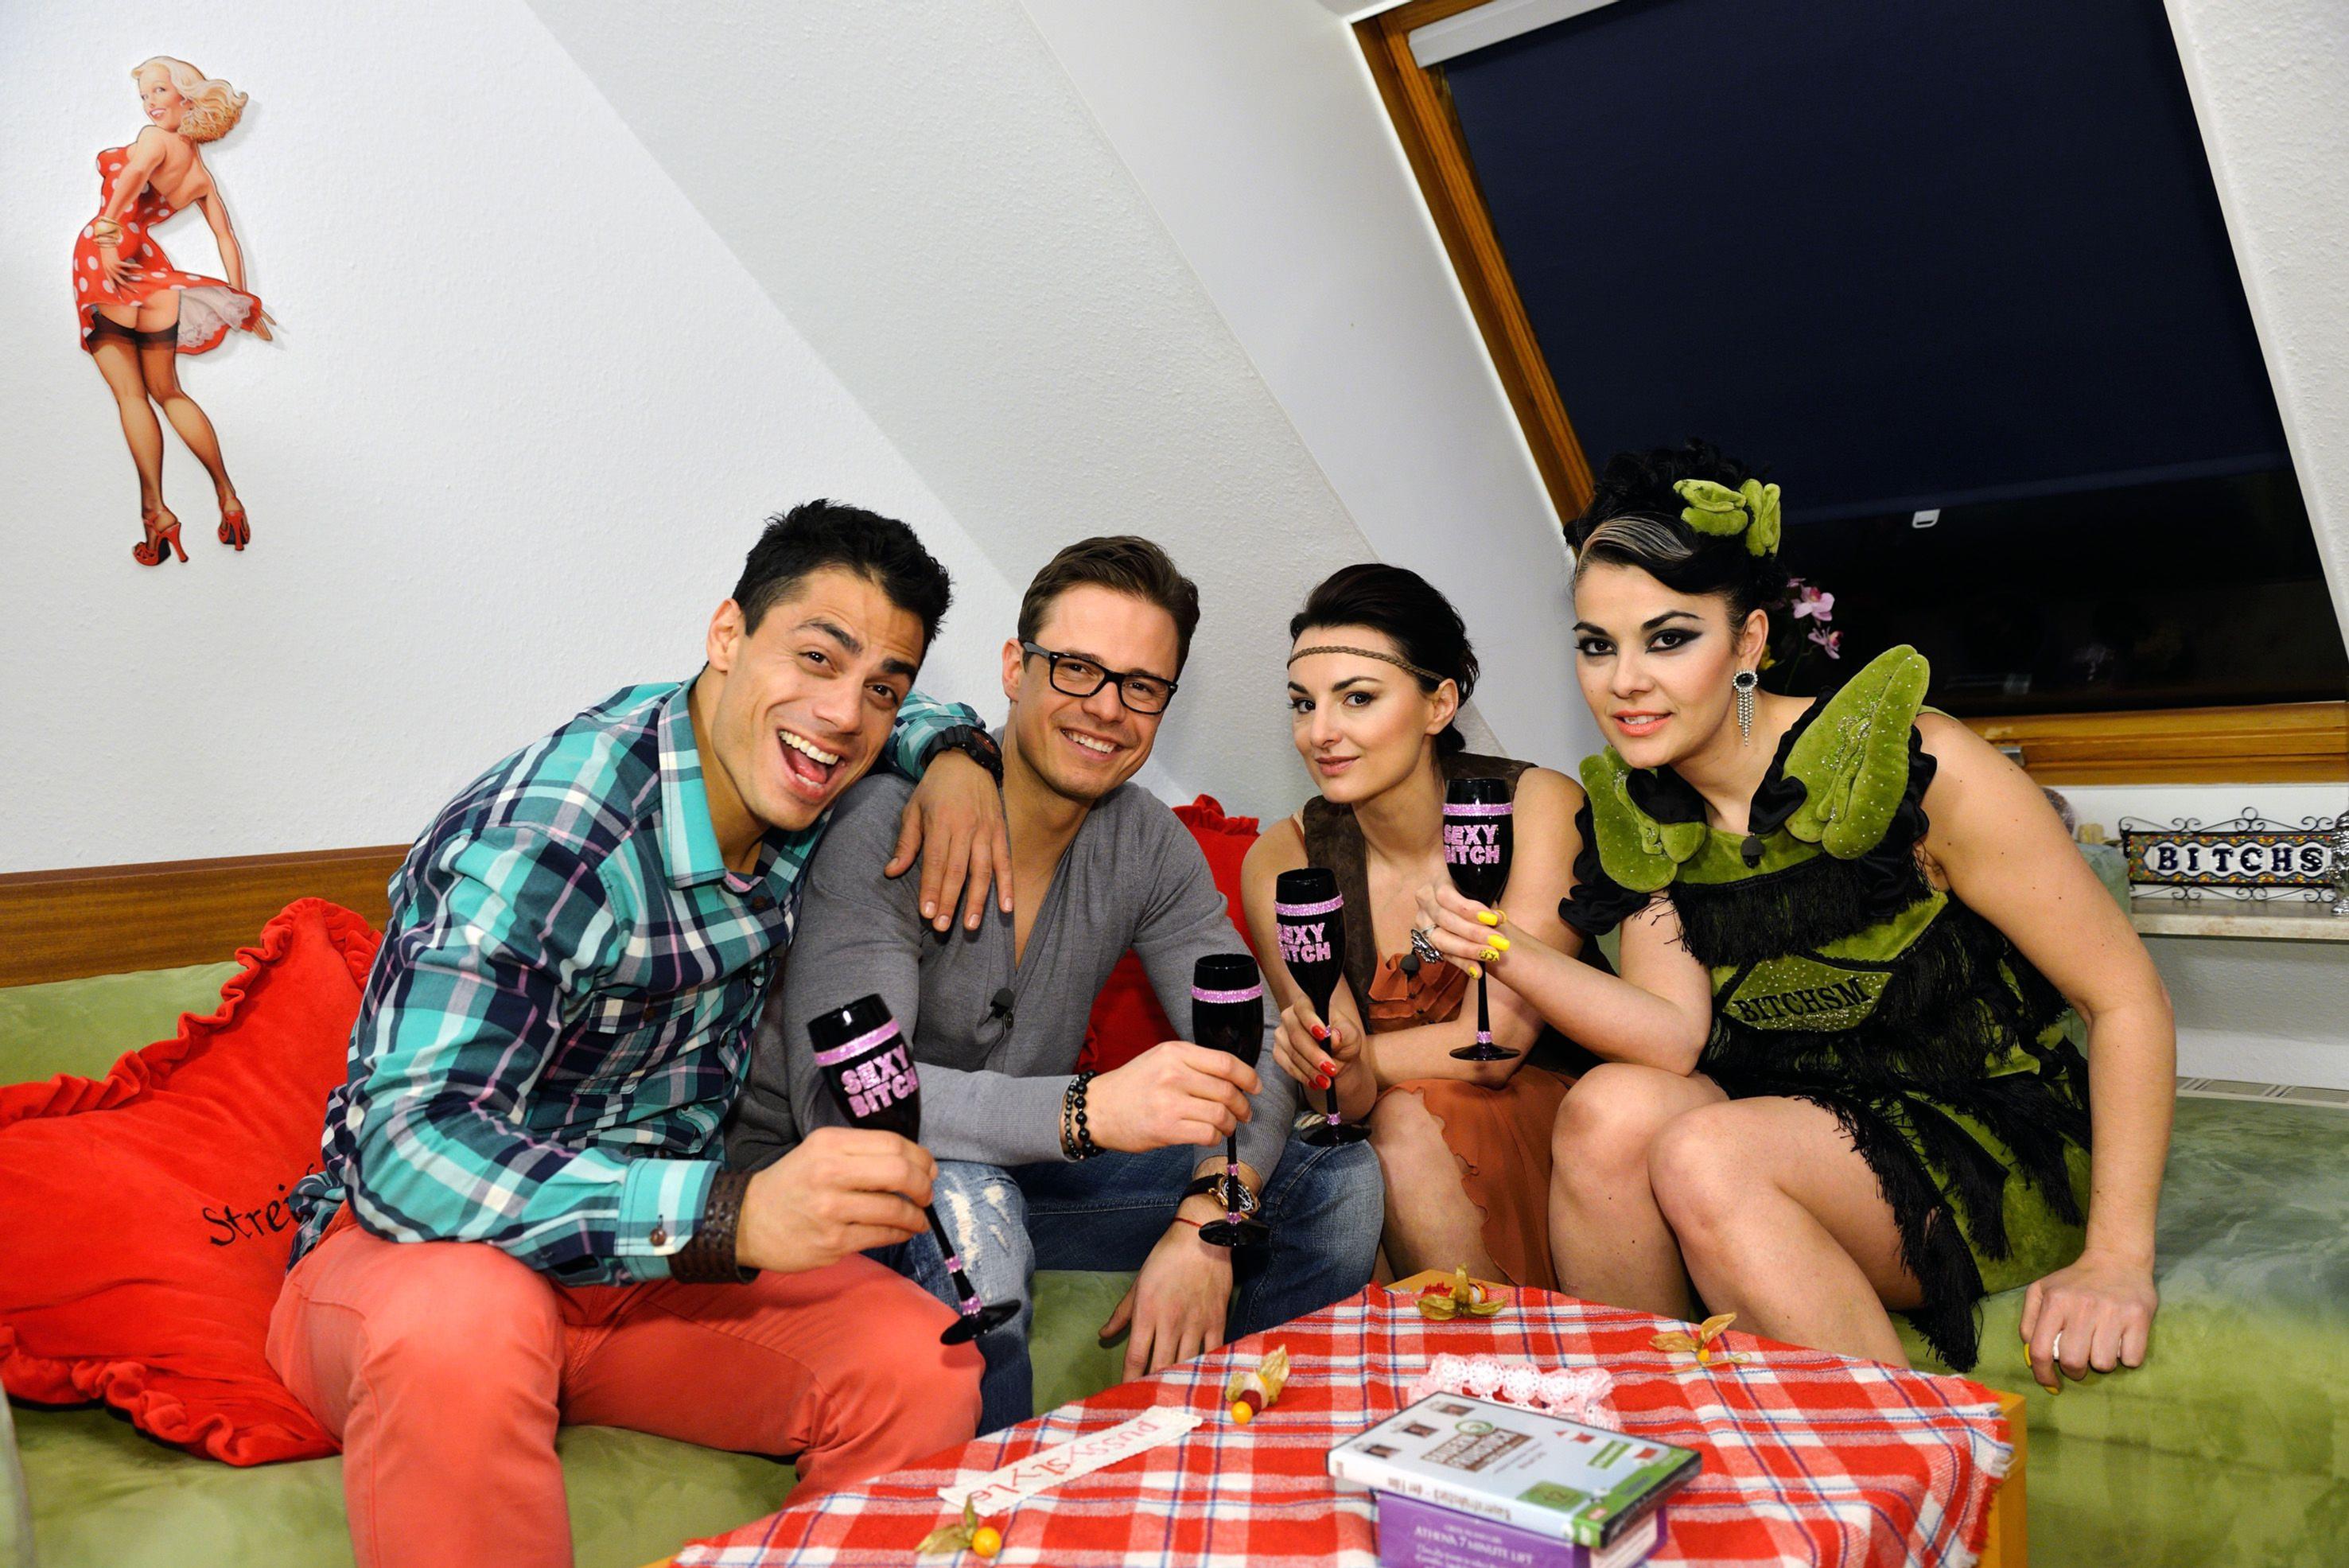 Silva Gonzales, Pete Dwojak, Miranda Leonhardt und Gastgeberin Lady Bitch Ray.